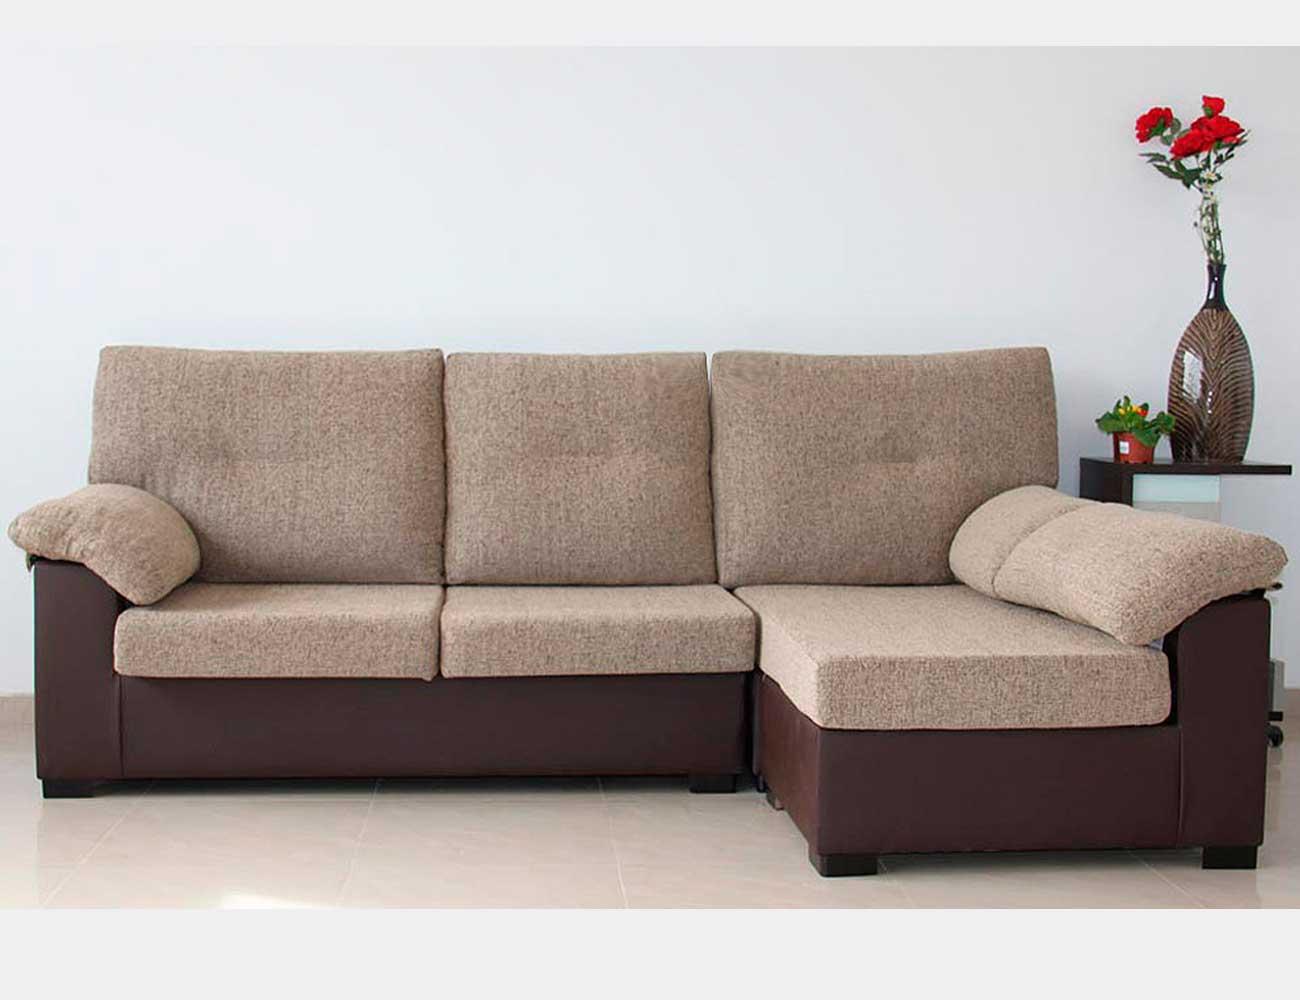 Sofa chaise longue barato2